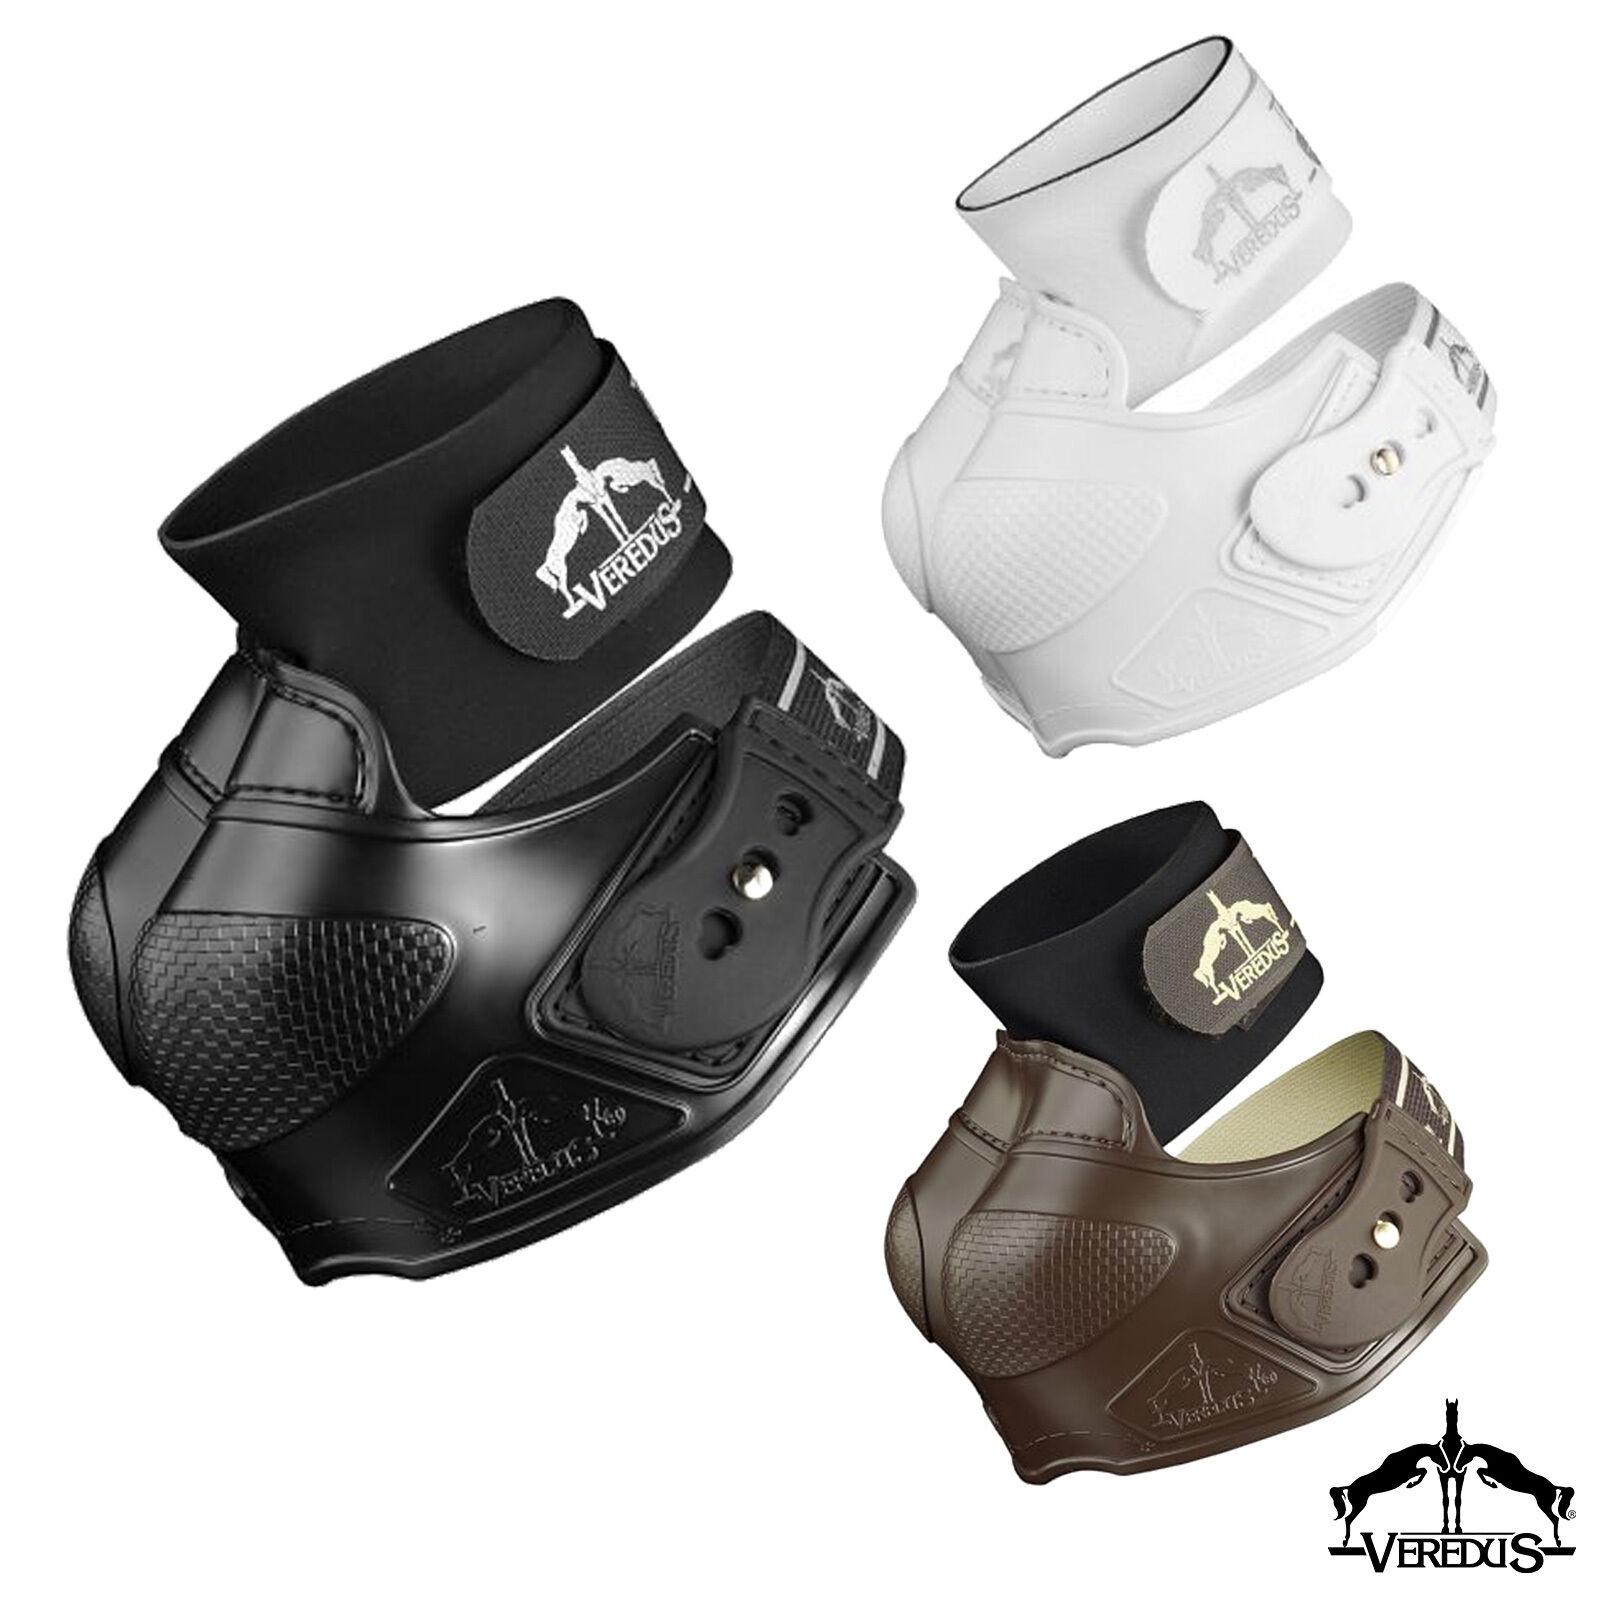 VeROTus TEKNO SHIELD Professional Professional SHIELD OVER REACH Stiefel Horse Overreach Stiefel 449cef